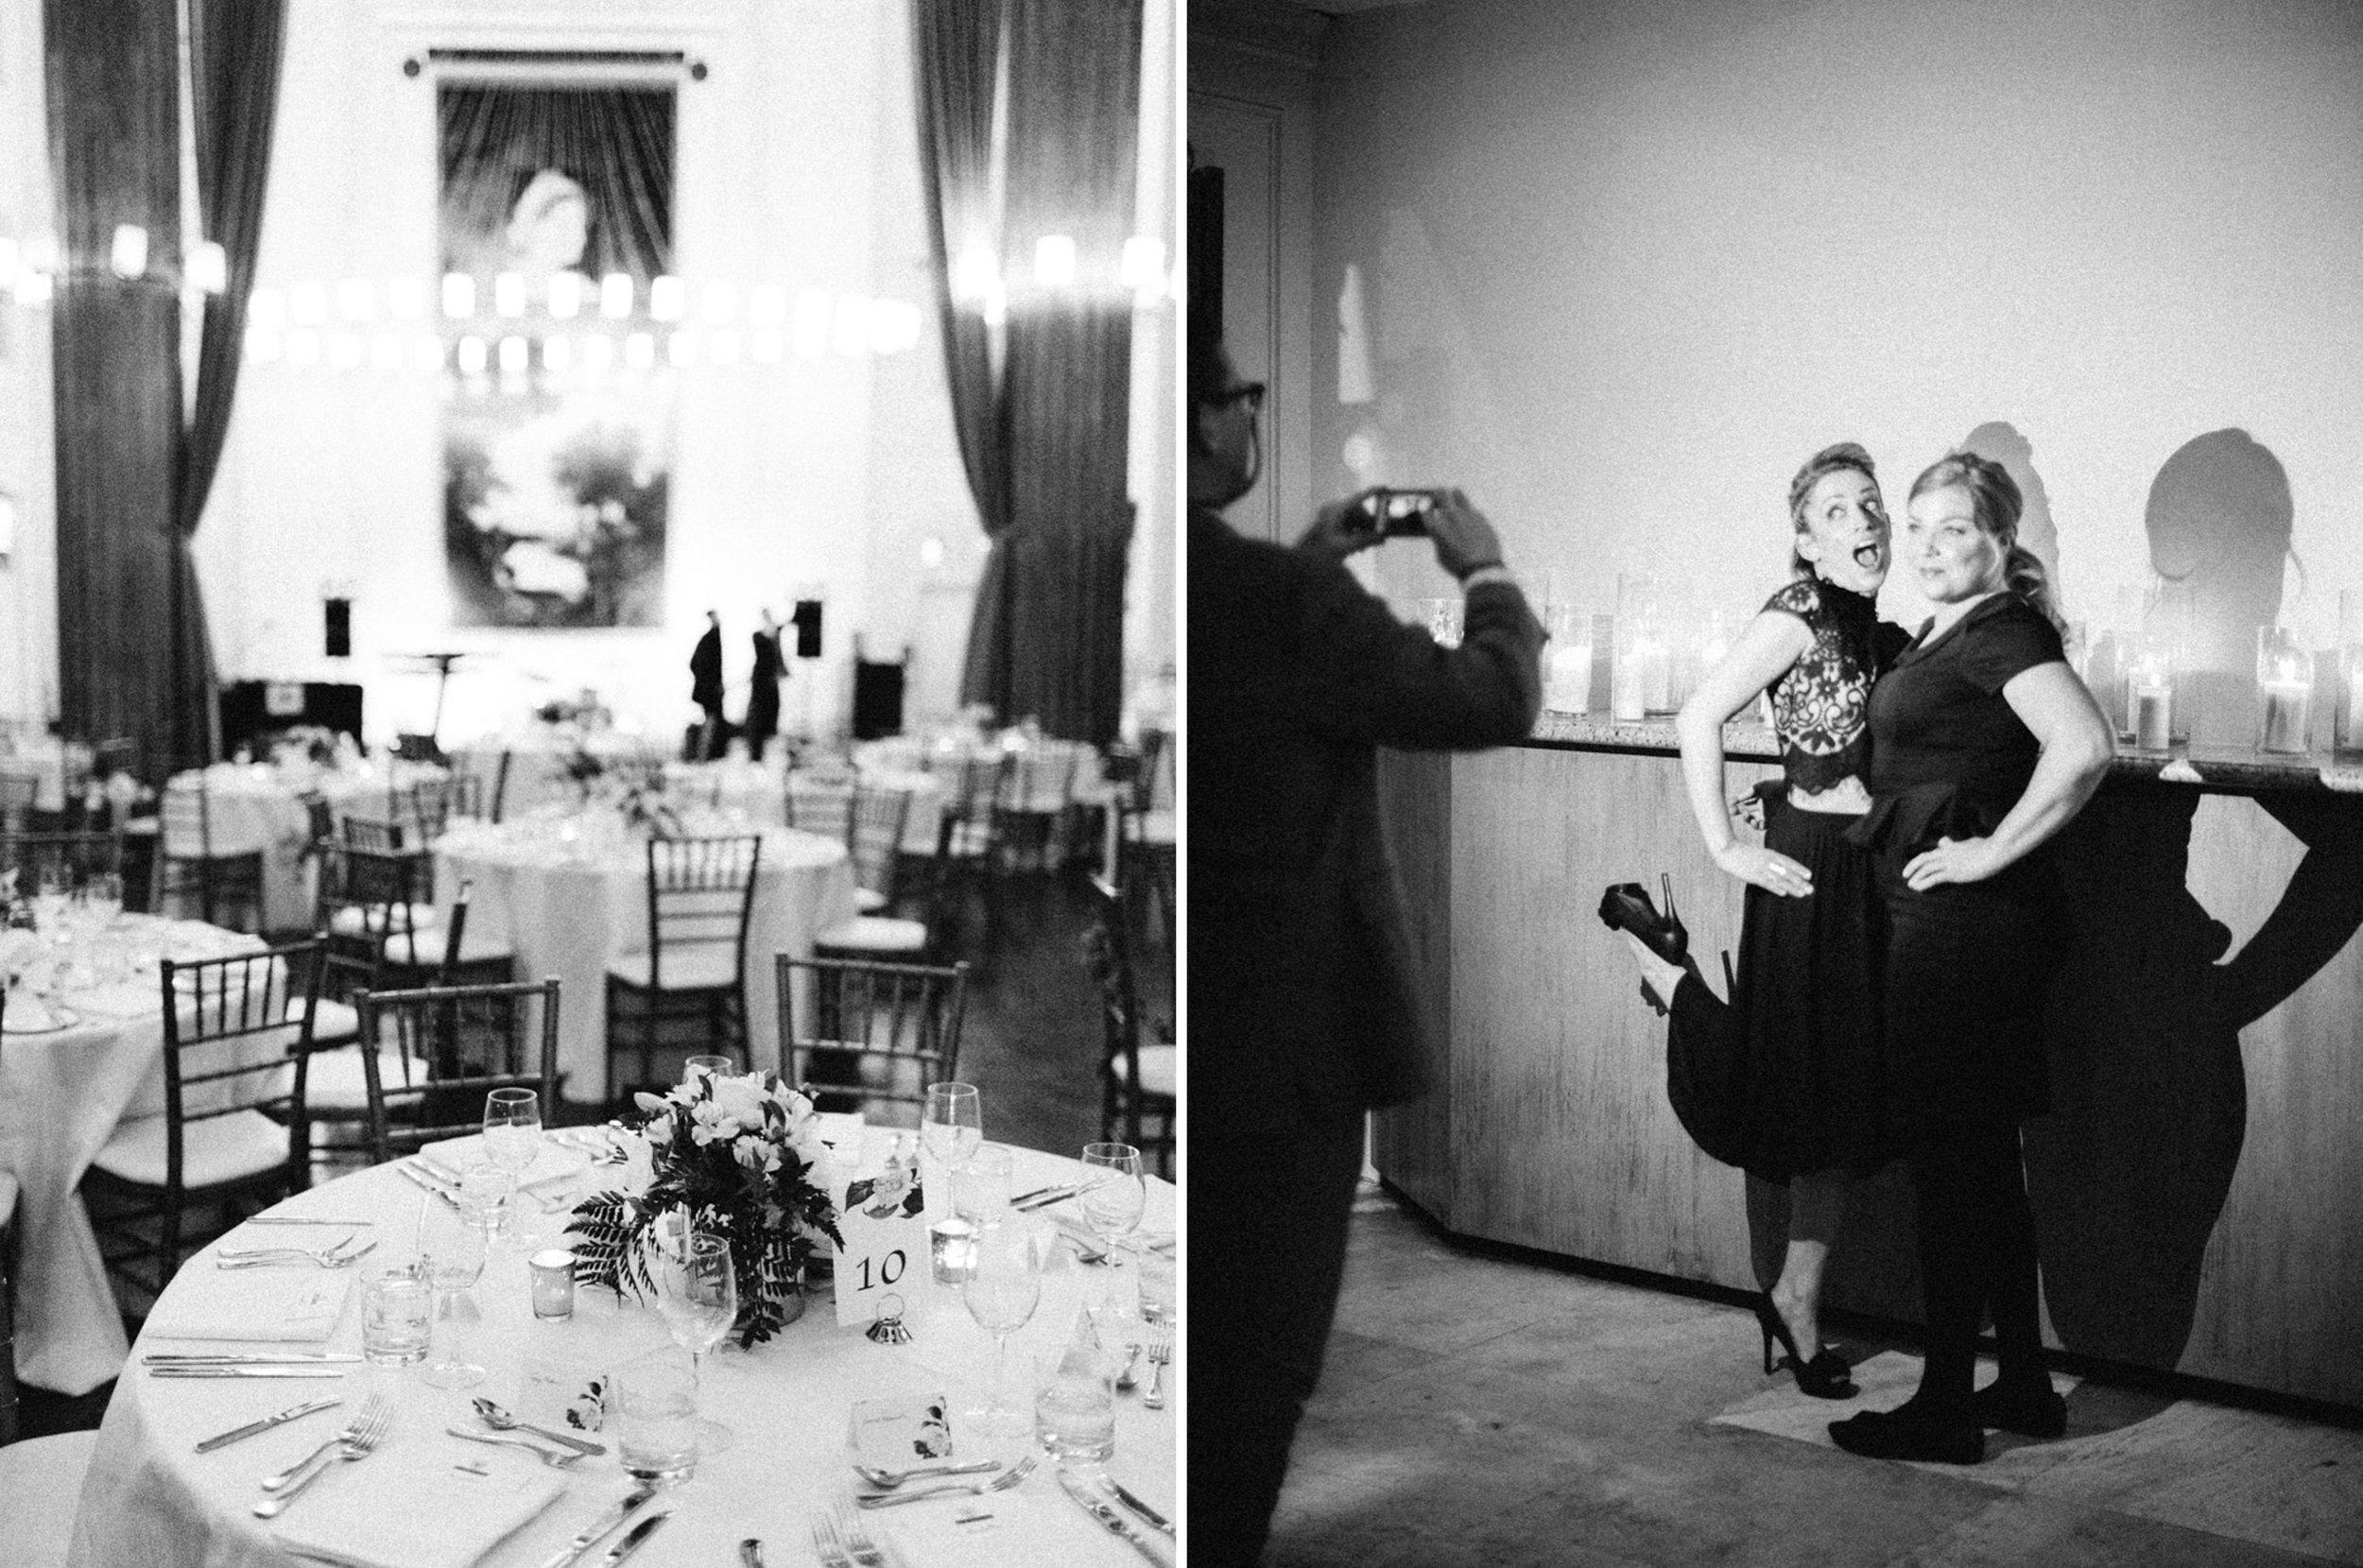 toronto_wedding_photographer_winter_wedding8.jpg